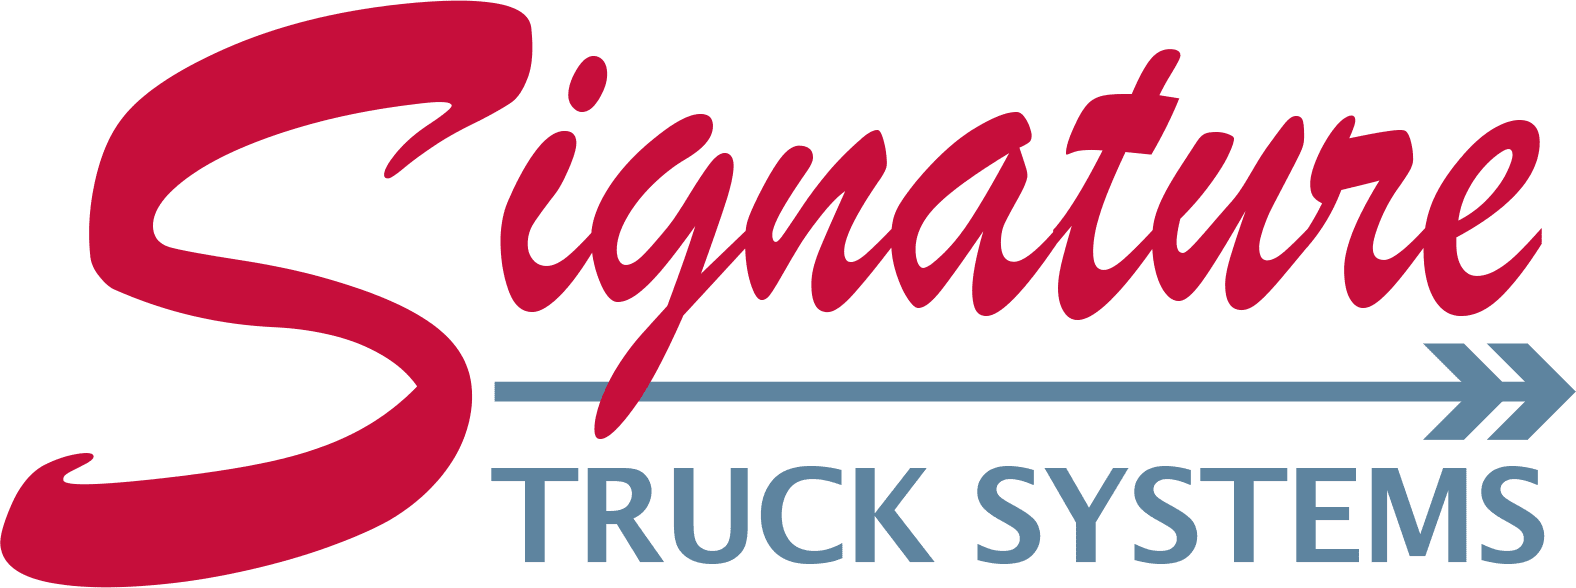 Signature Truck Systems logo